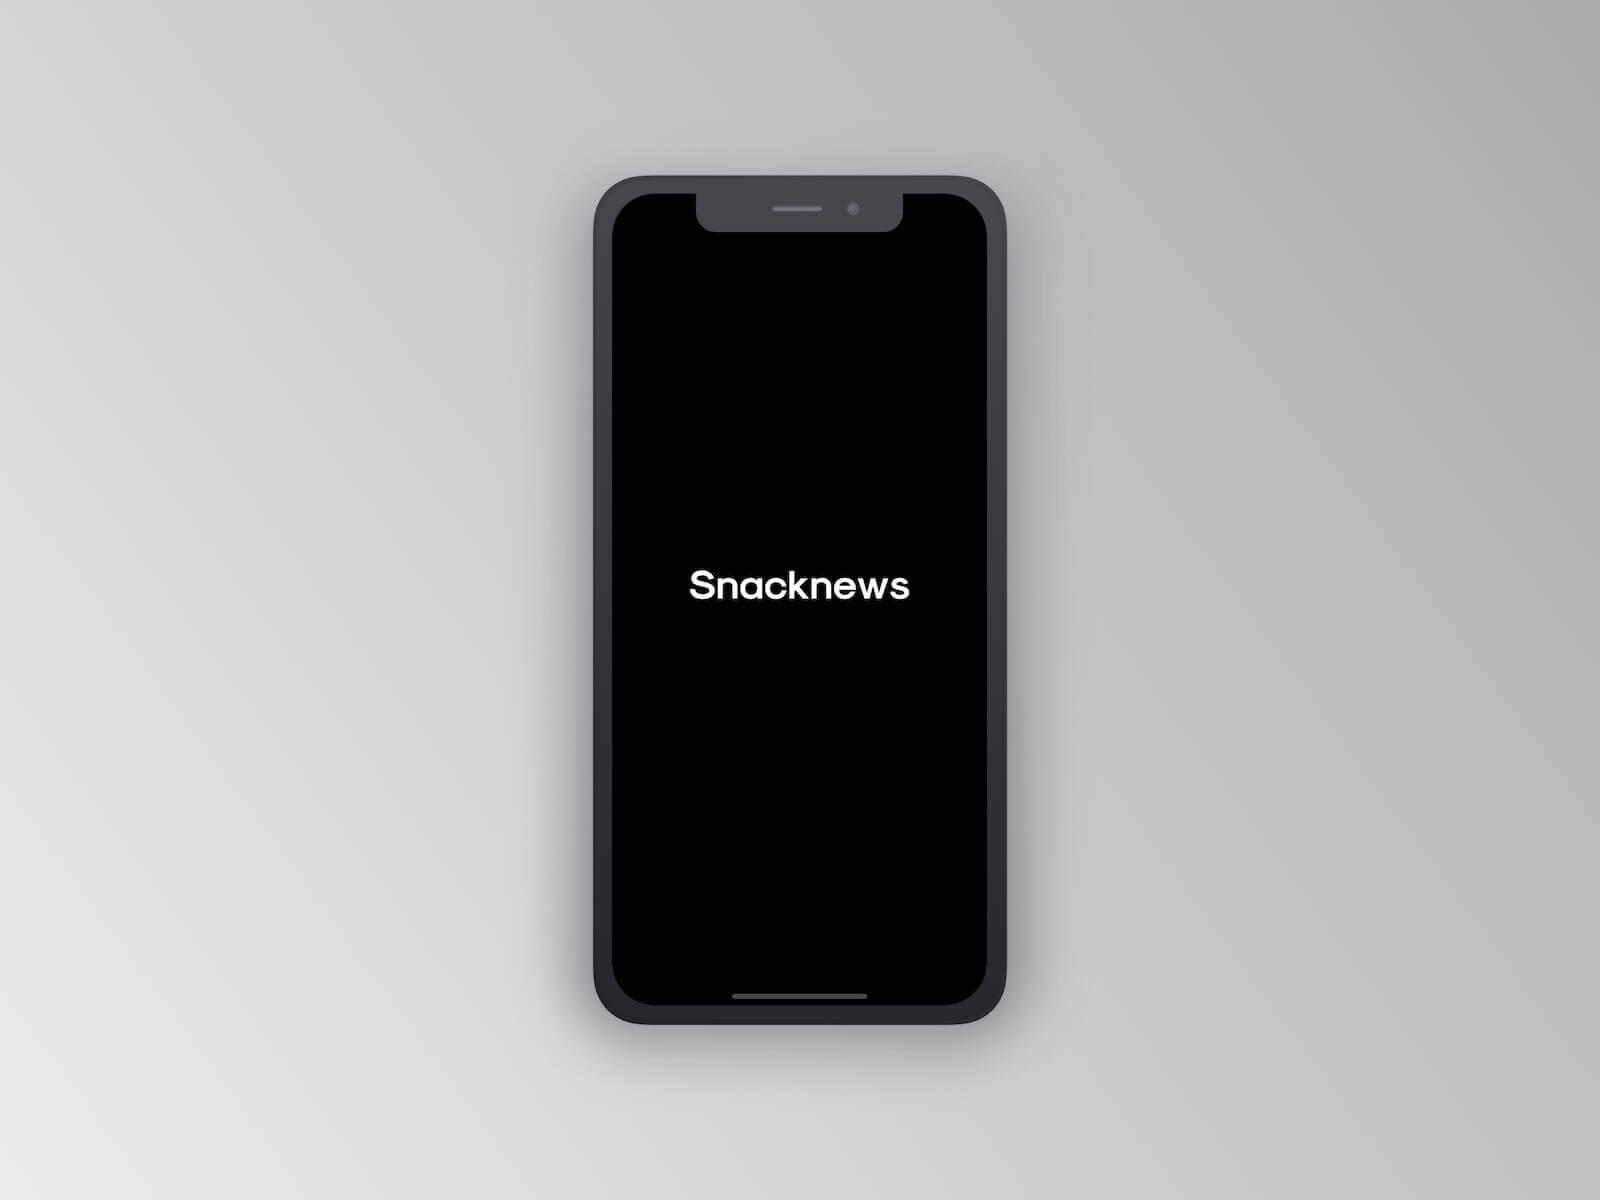 Snacknews